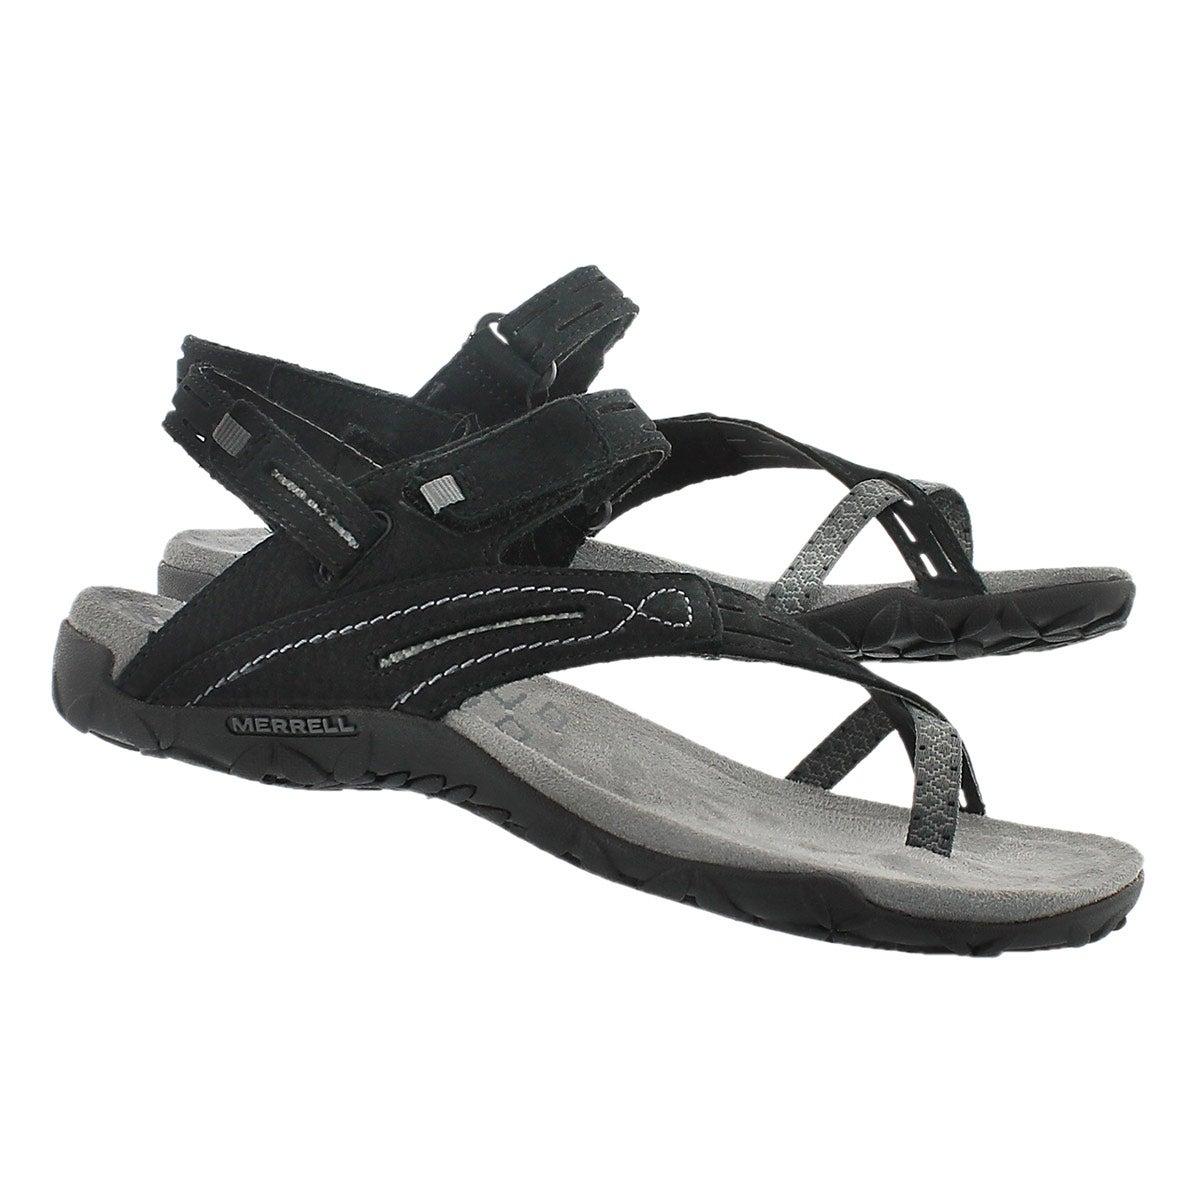 Lds Terran Convertible II black sandal